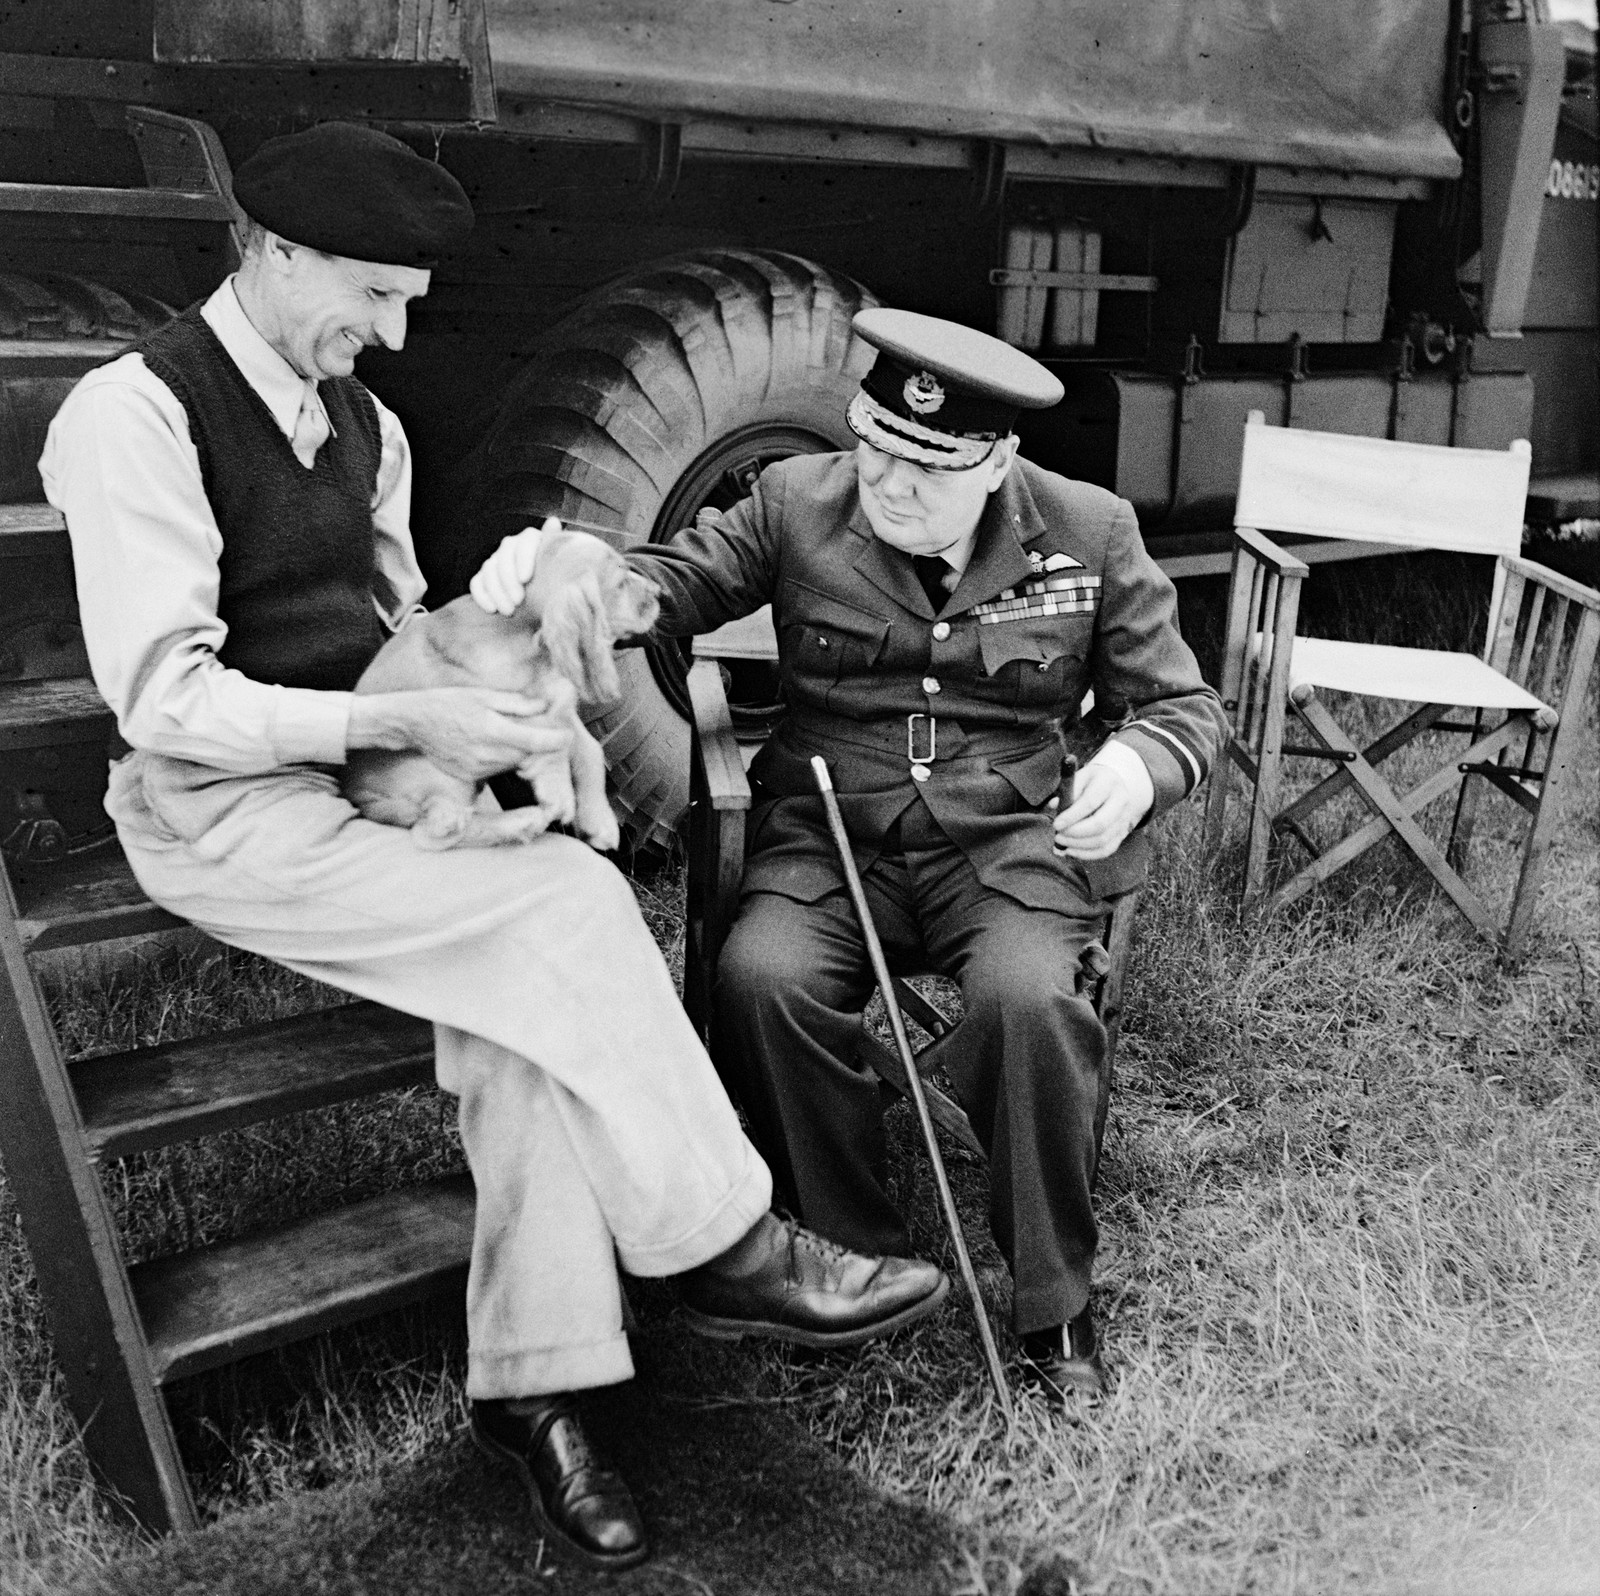 Statsminister Winston Churchill i 1944 sammen med general Sir Bernard Montgomery og hunden hans.